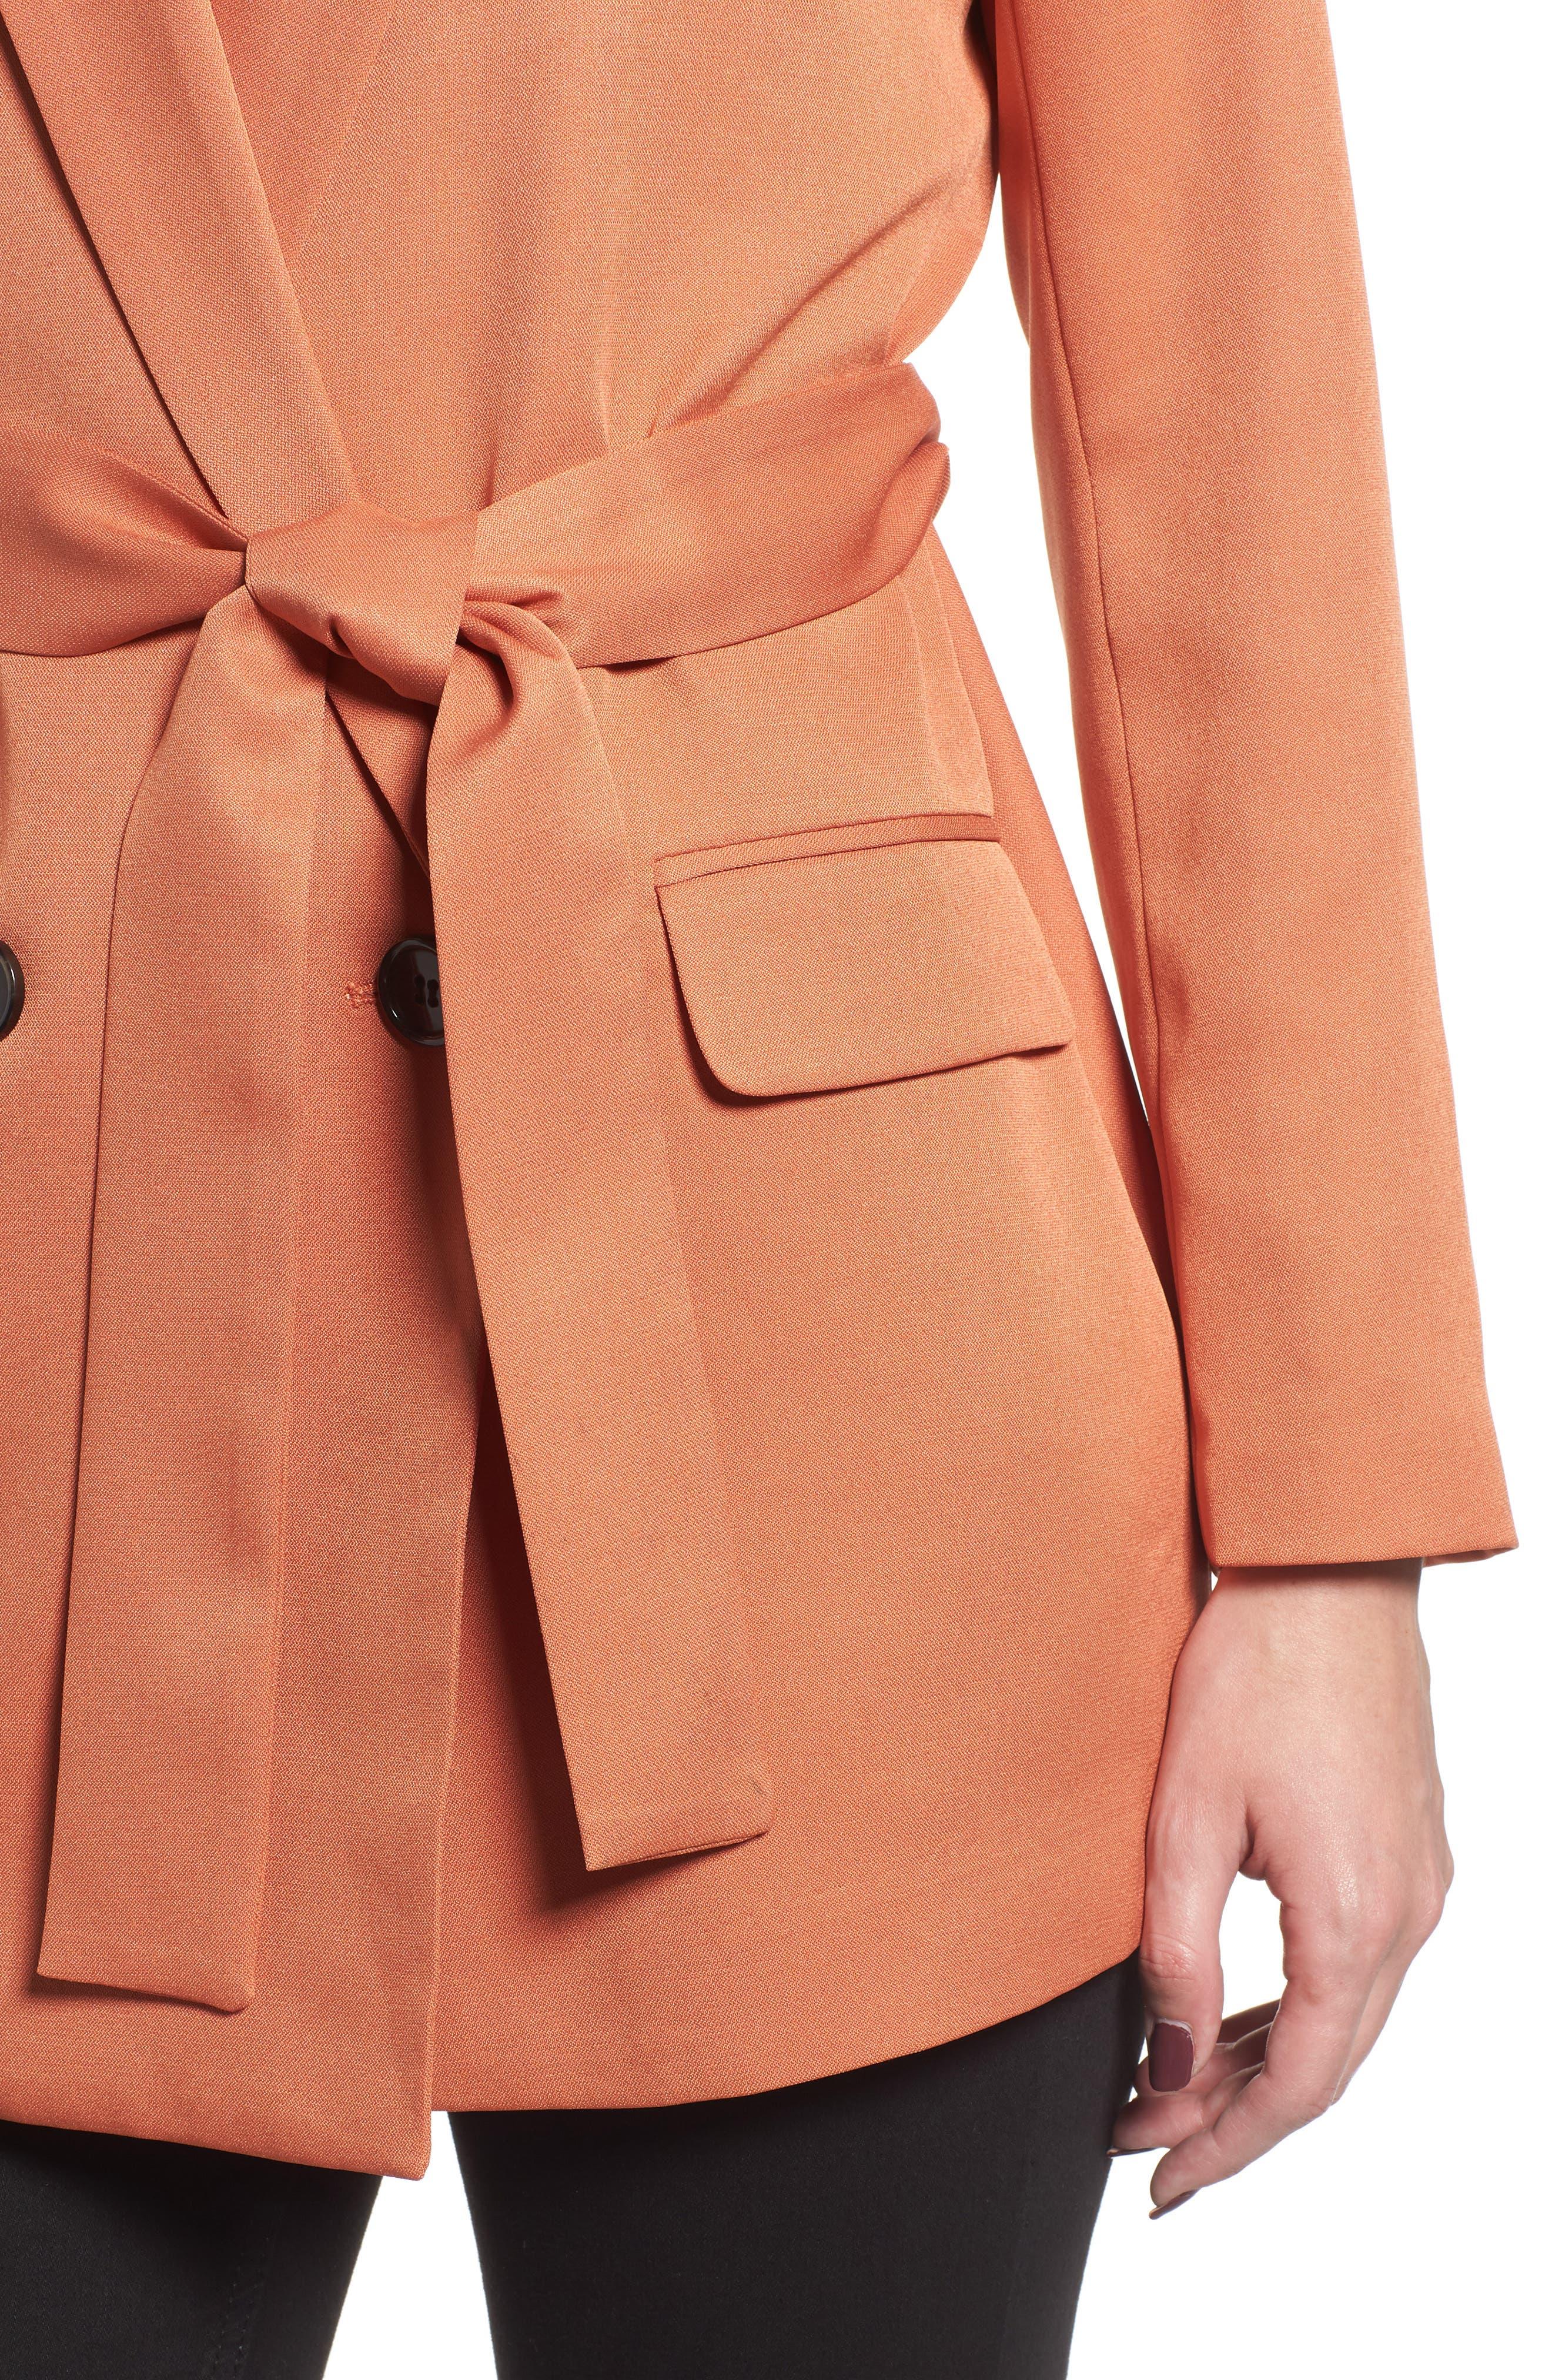 MURAL,                             Belted Blazer,                             Alternate thumbnail 5, color,                             200